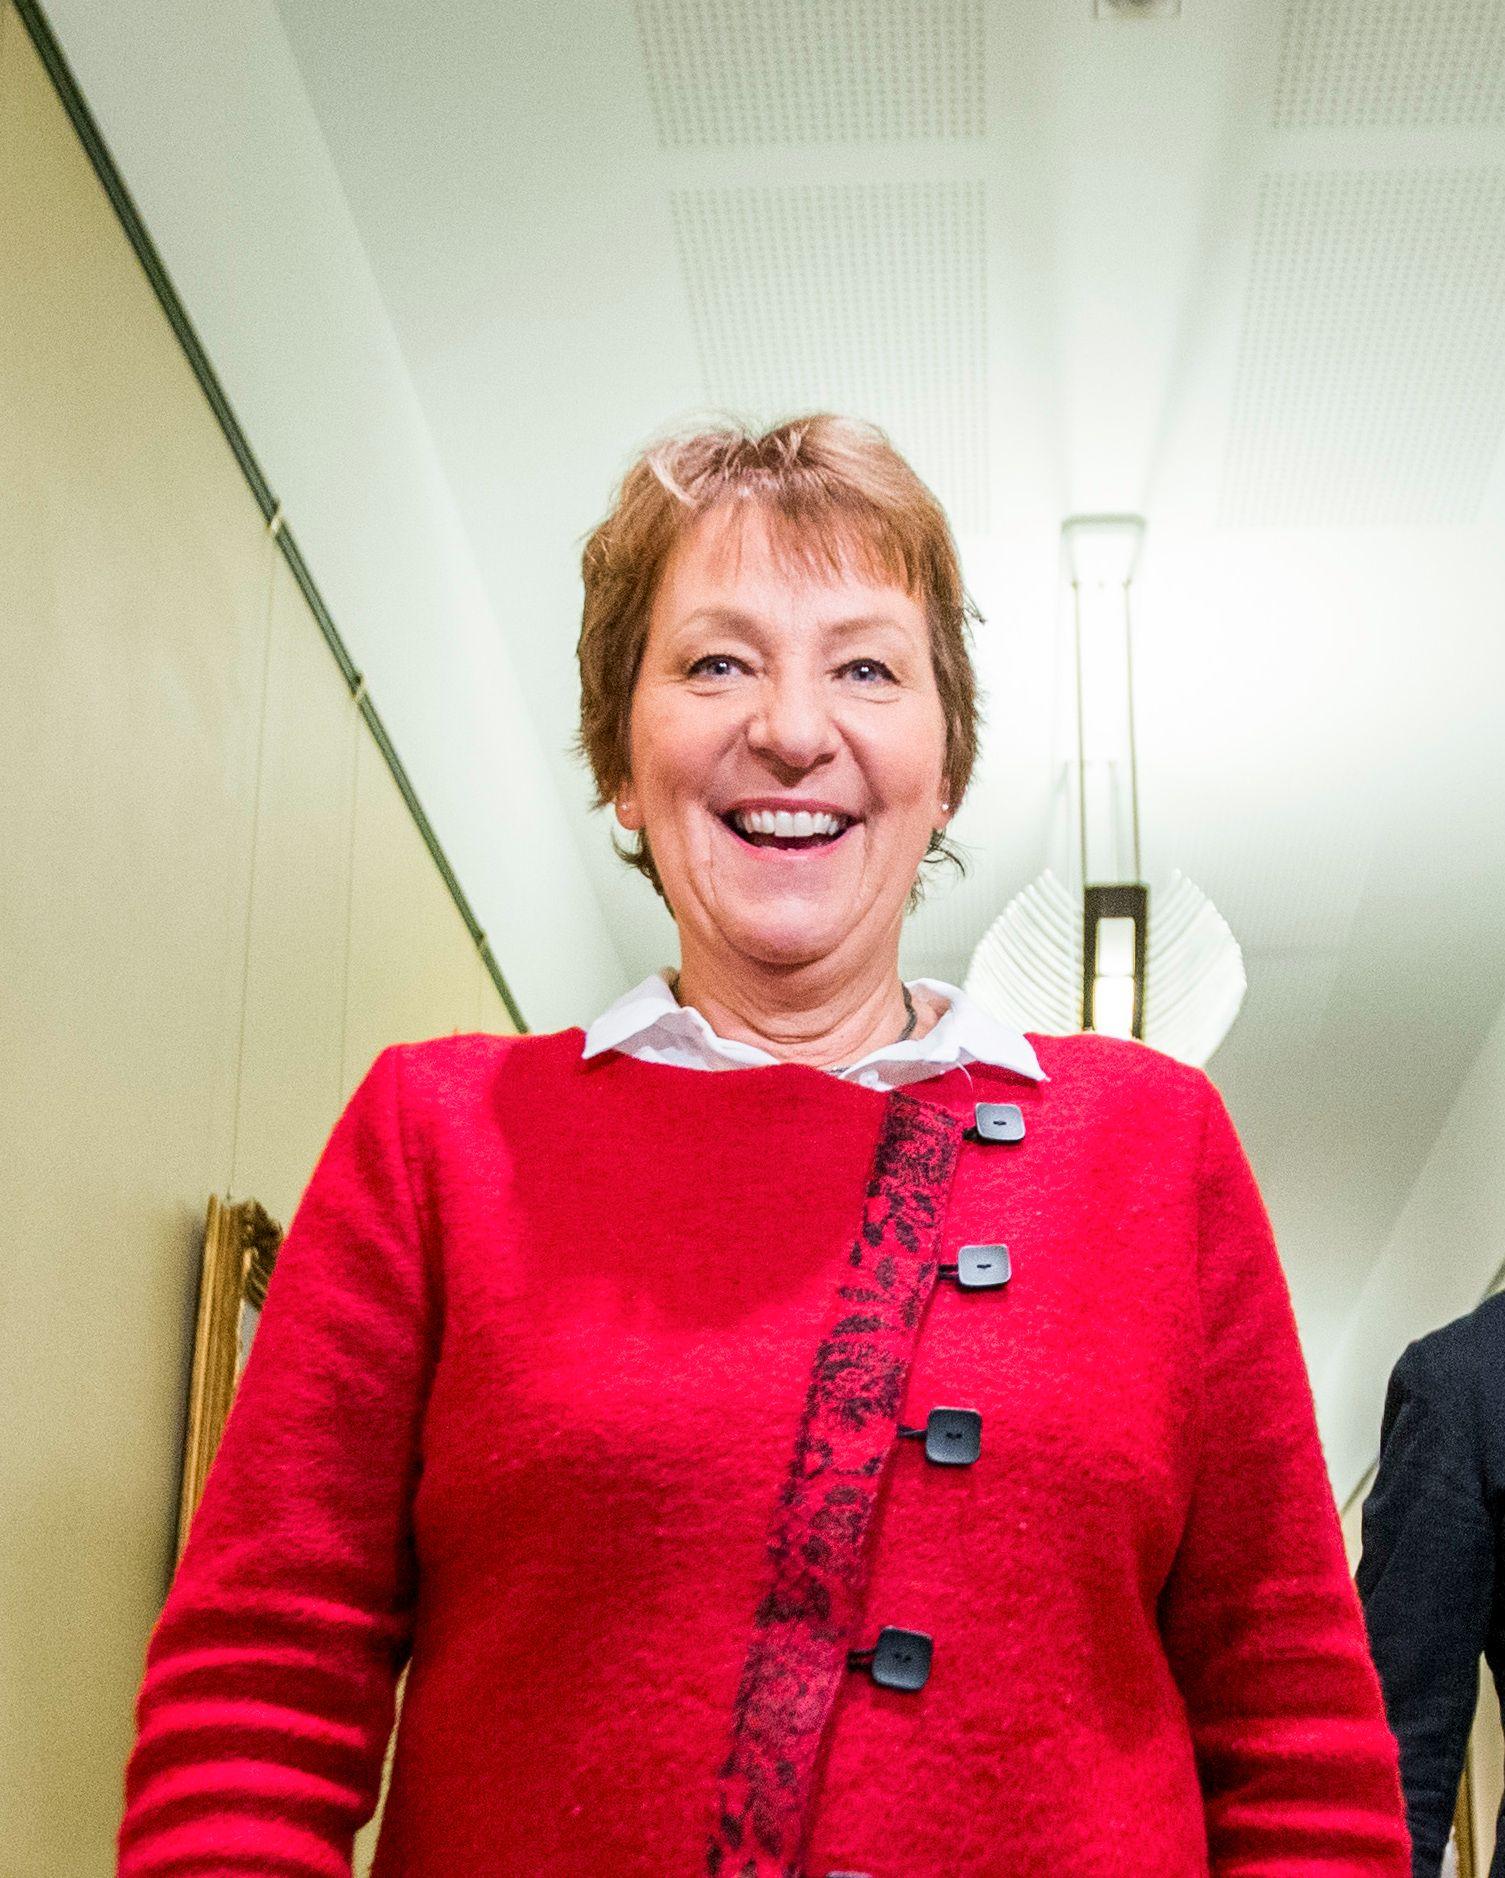 SKAL VIE: Oslo-ordfører Marianne Borgen (SV) skal ifølge den vordende bruden vie Olav Thon og Sissel Berdal Haga.